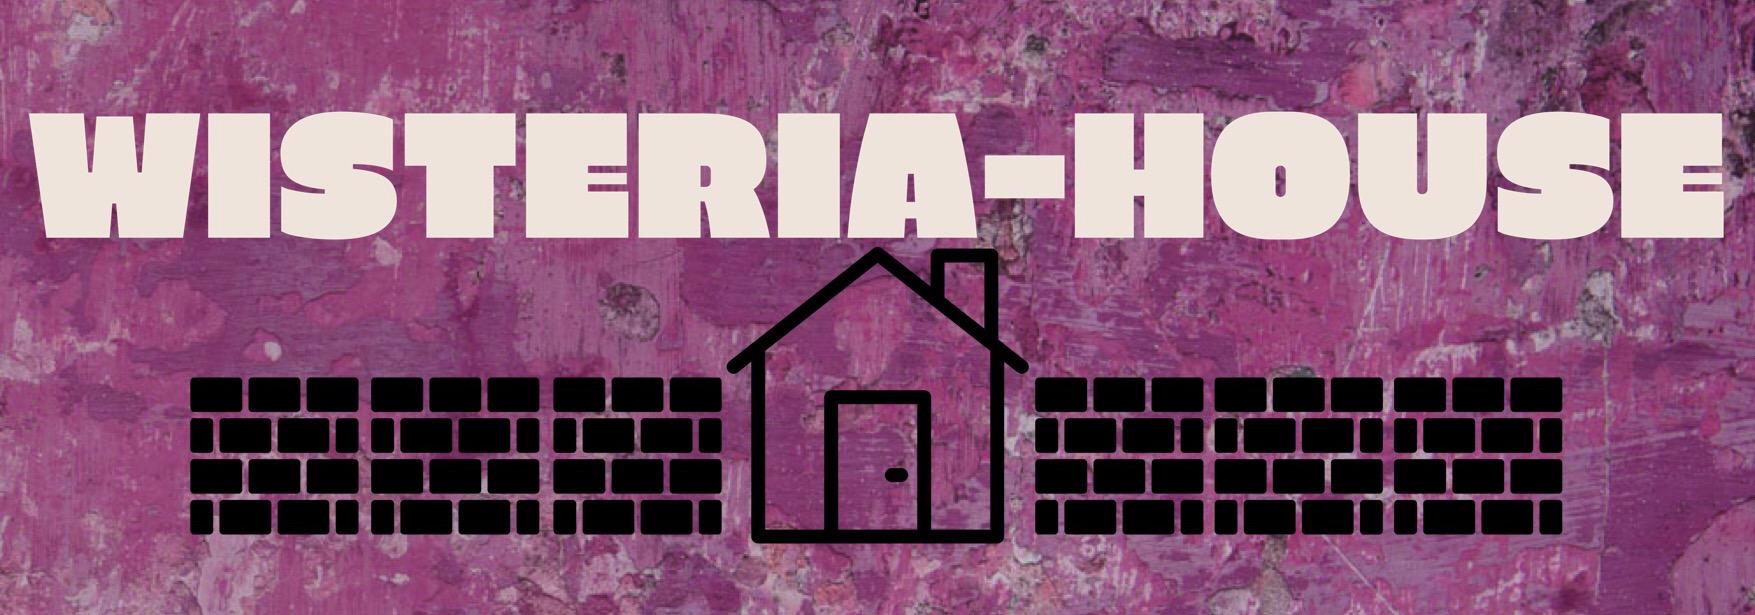 WISTERIA-HOUSE